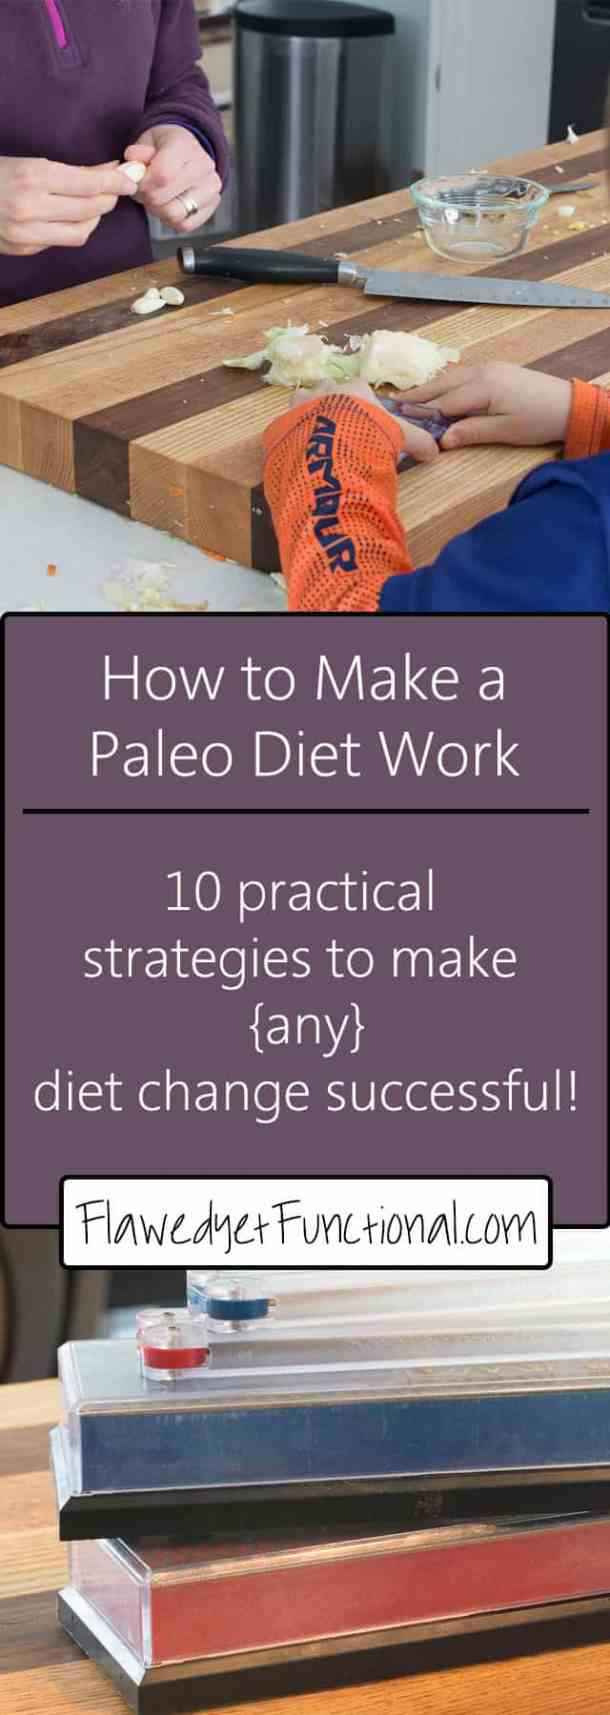 Paleo strategies